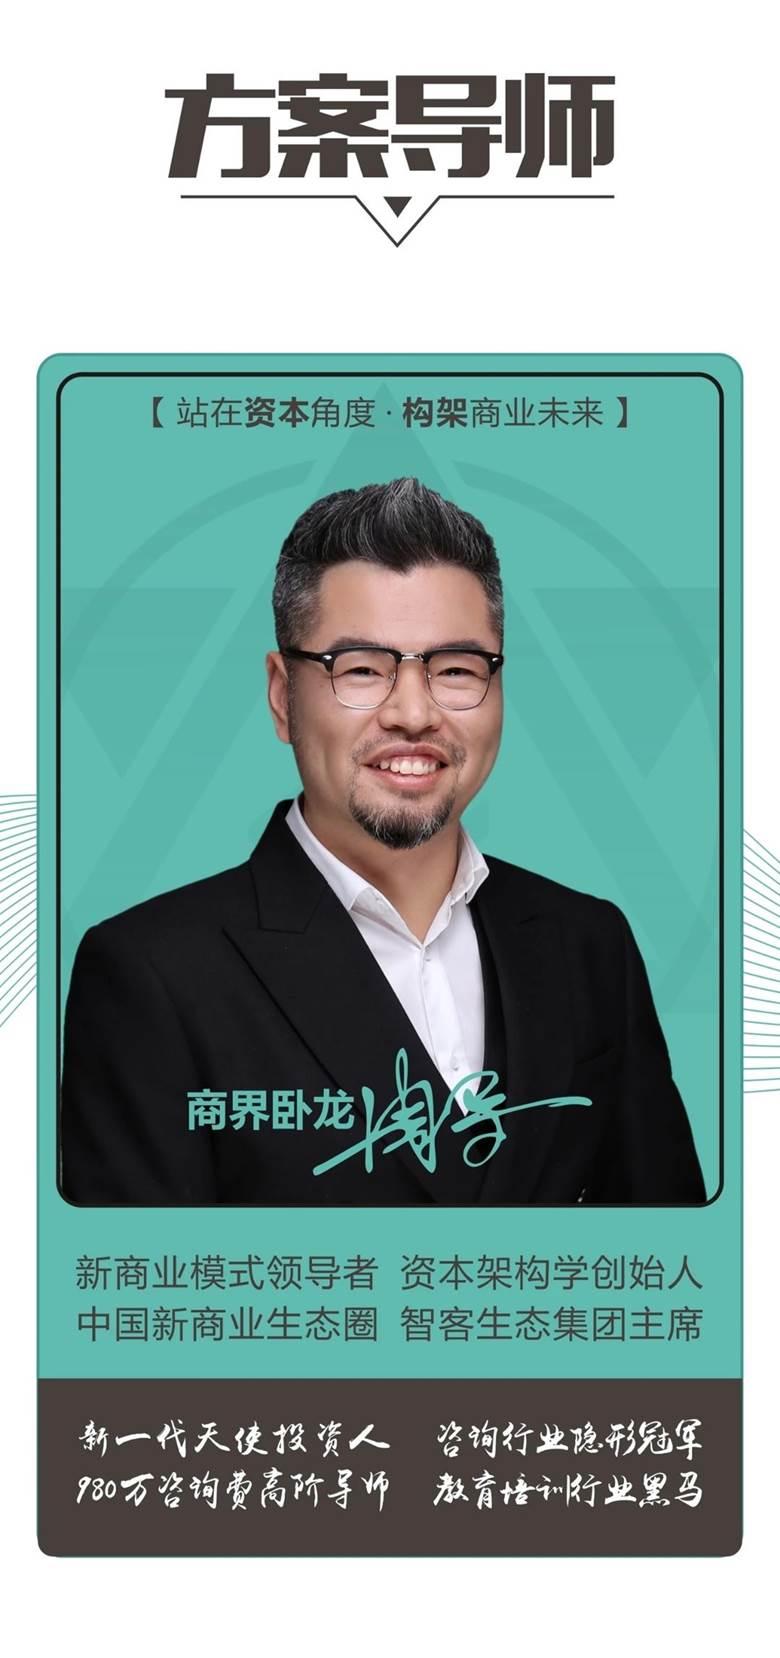 http://www.huodongxing.com/file/20191113/1063603644976/433659463953222.jpg